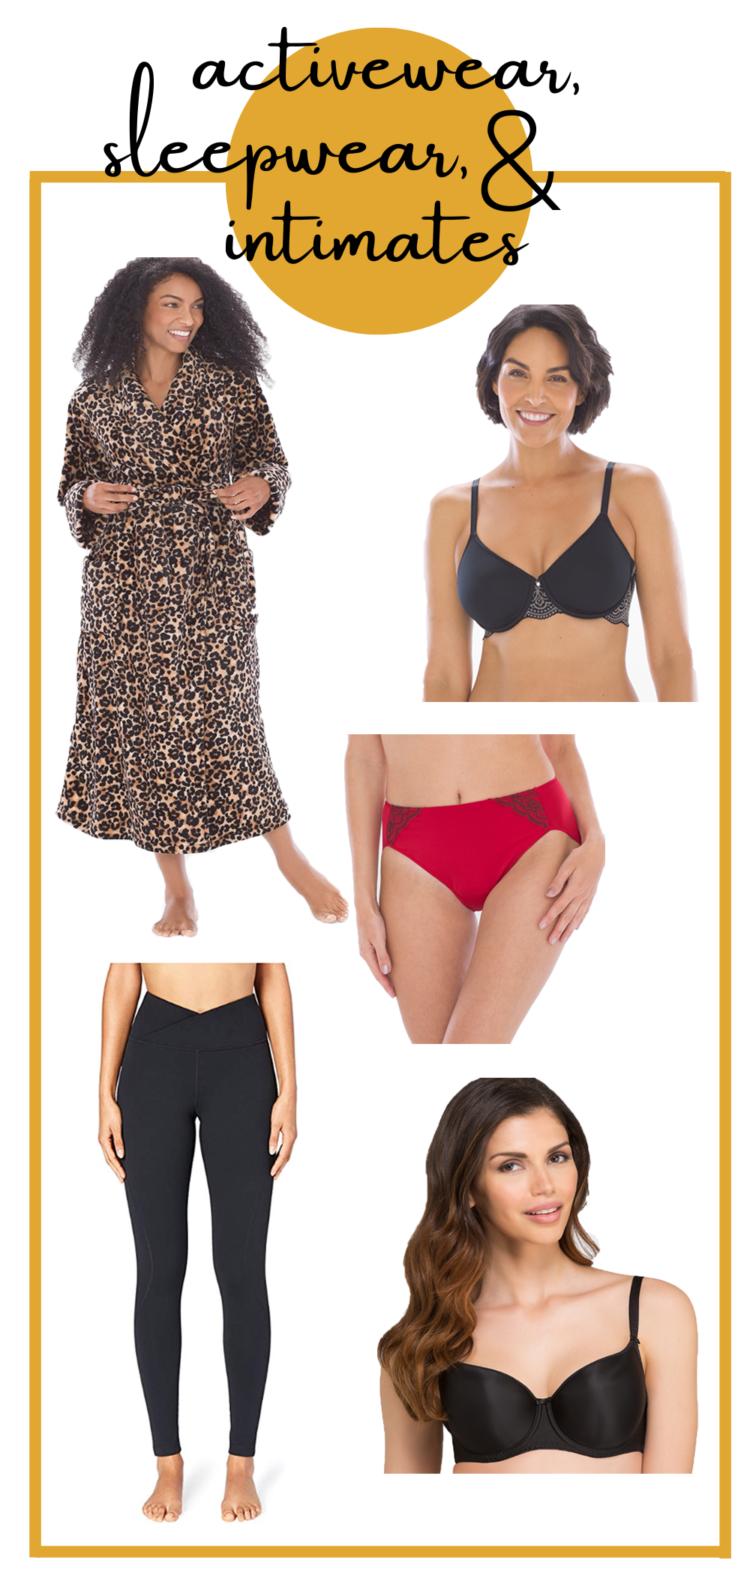 activewear sleepwear and intimages